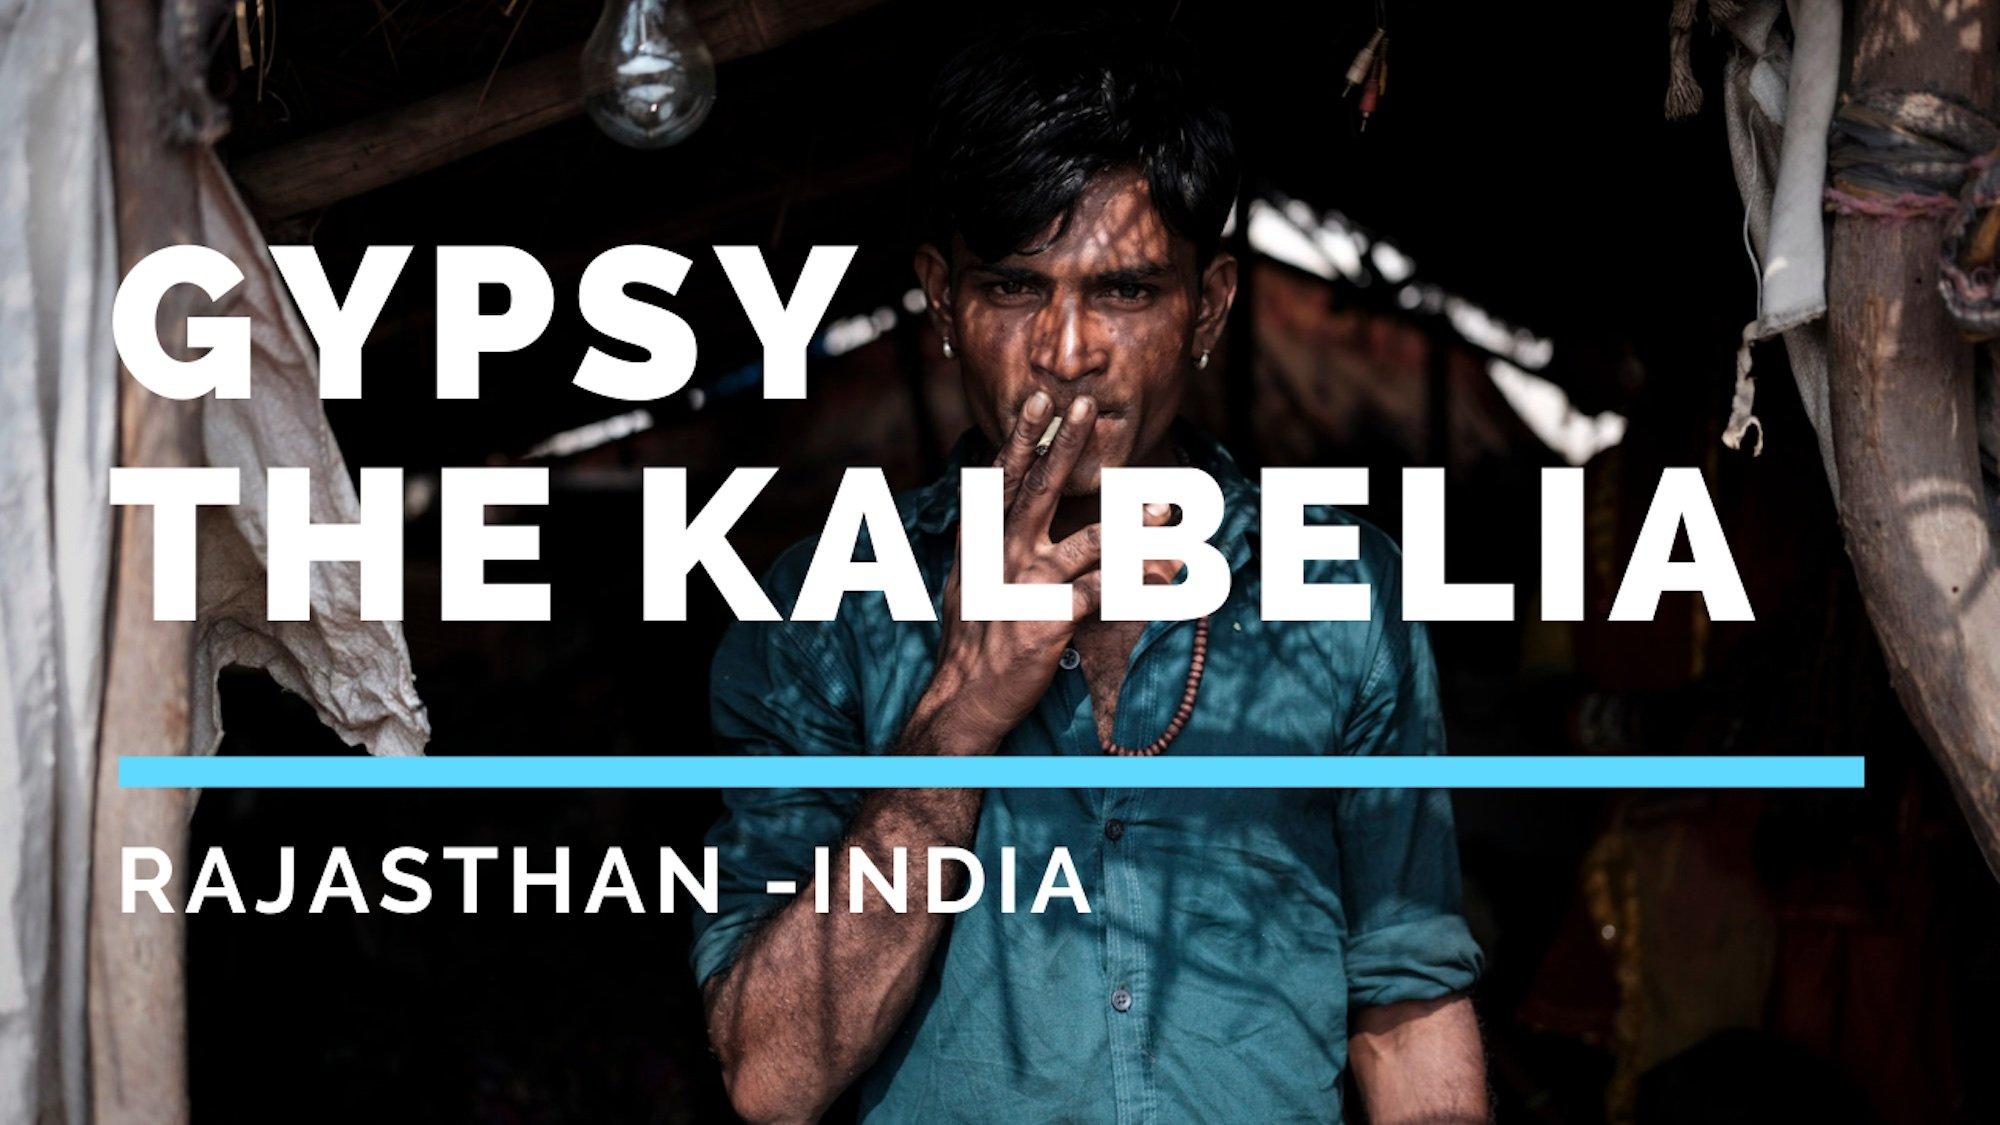 THE KALBELIA – Gypsies of Rajasthan, India